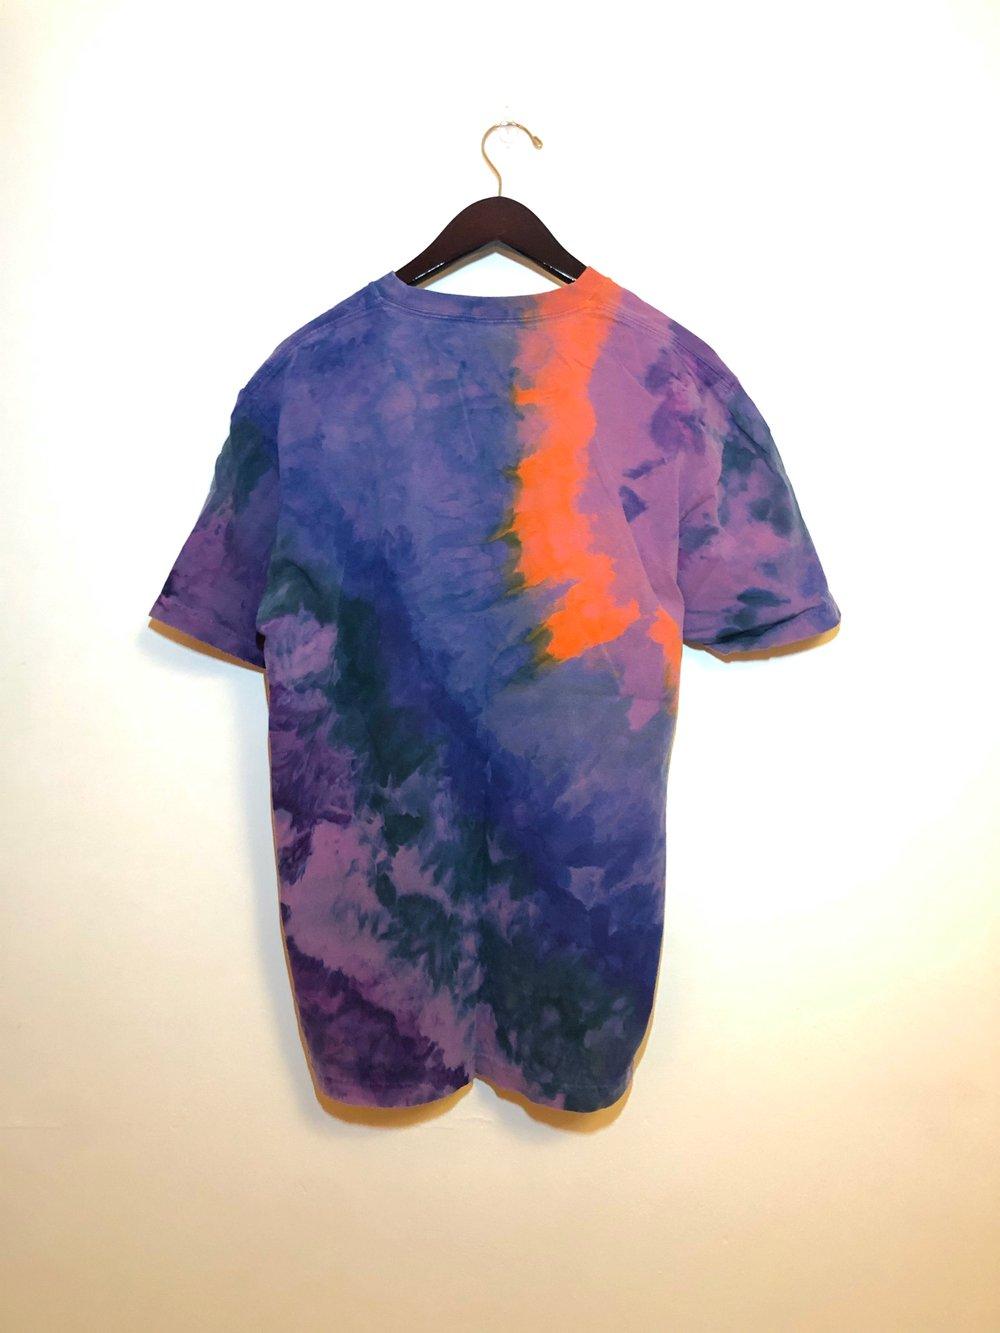 Shirt #32 - Medium